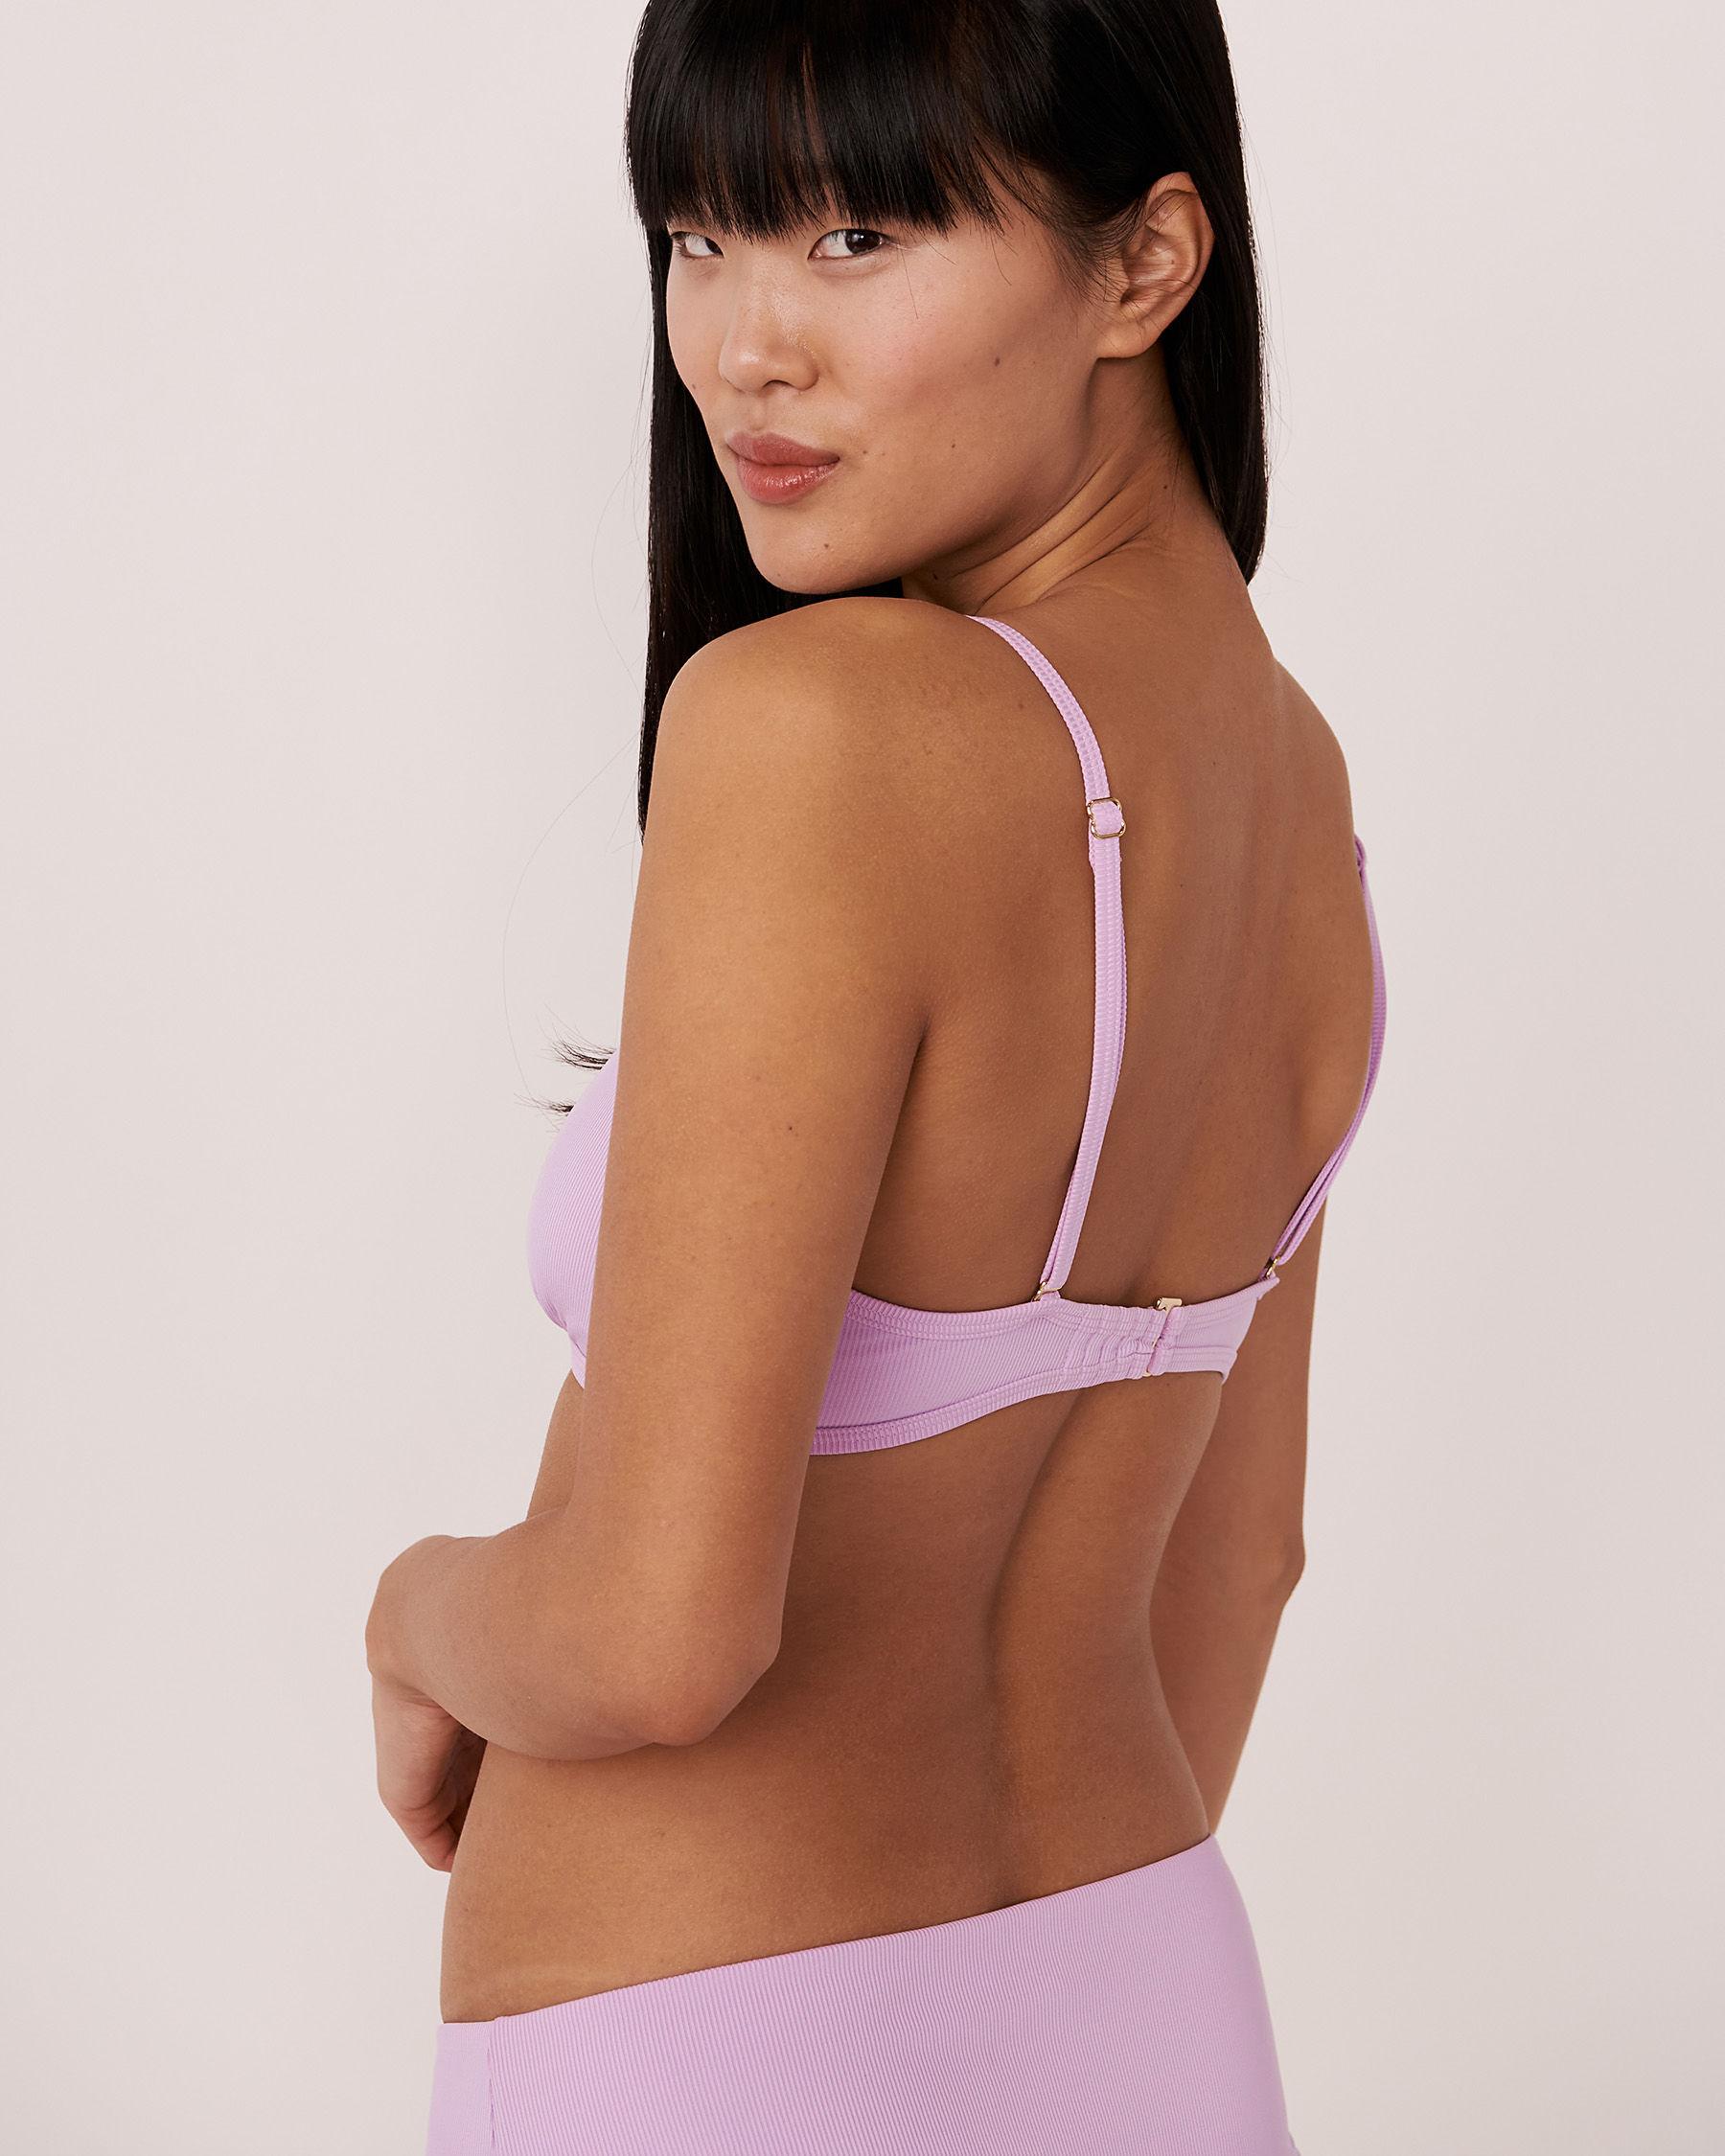 AQUAROSE Haut de bikini bralette en fibres recyclées SOLID RIB Lilas 70100059 - Voir2